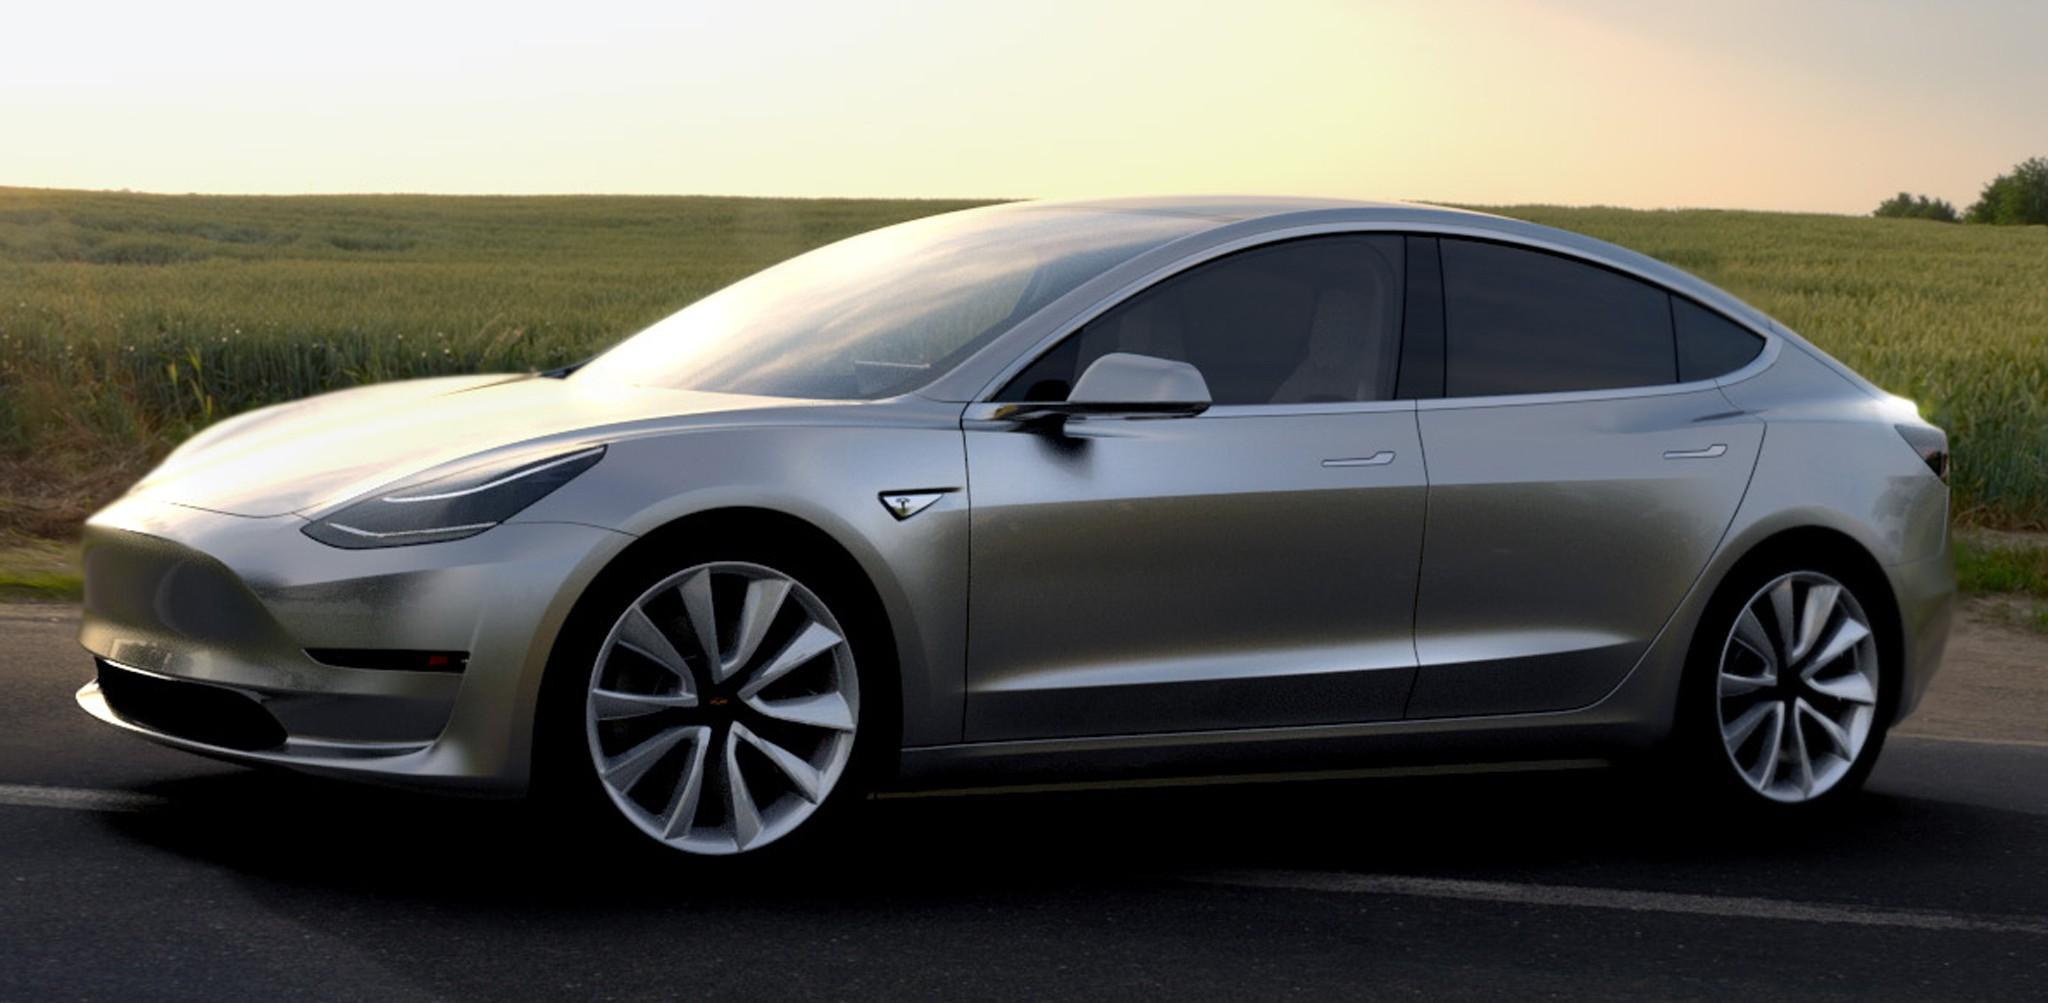 Tesla-Model-3-side-front-view-parked